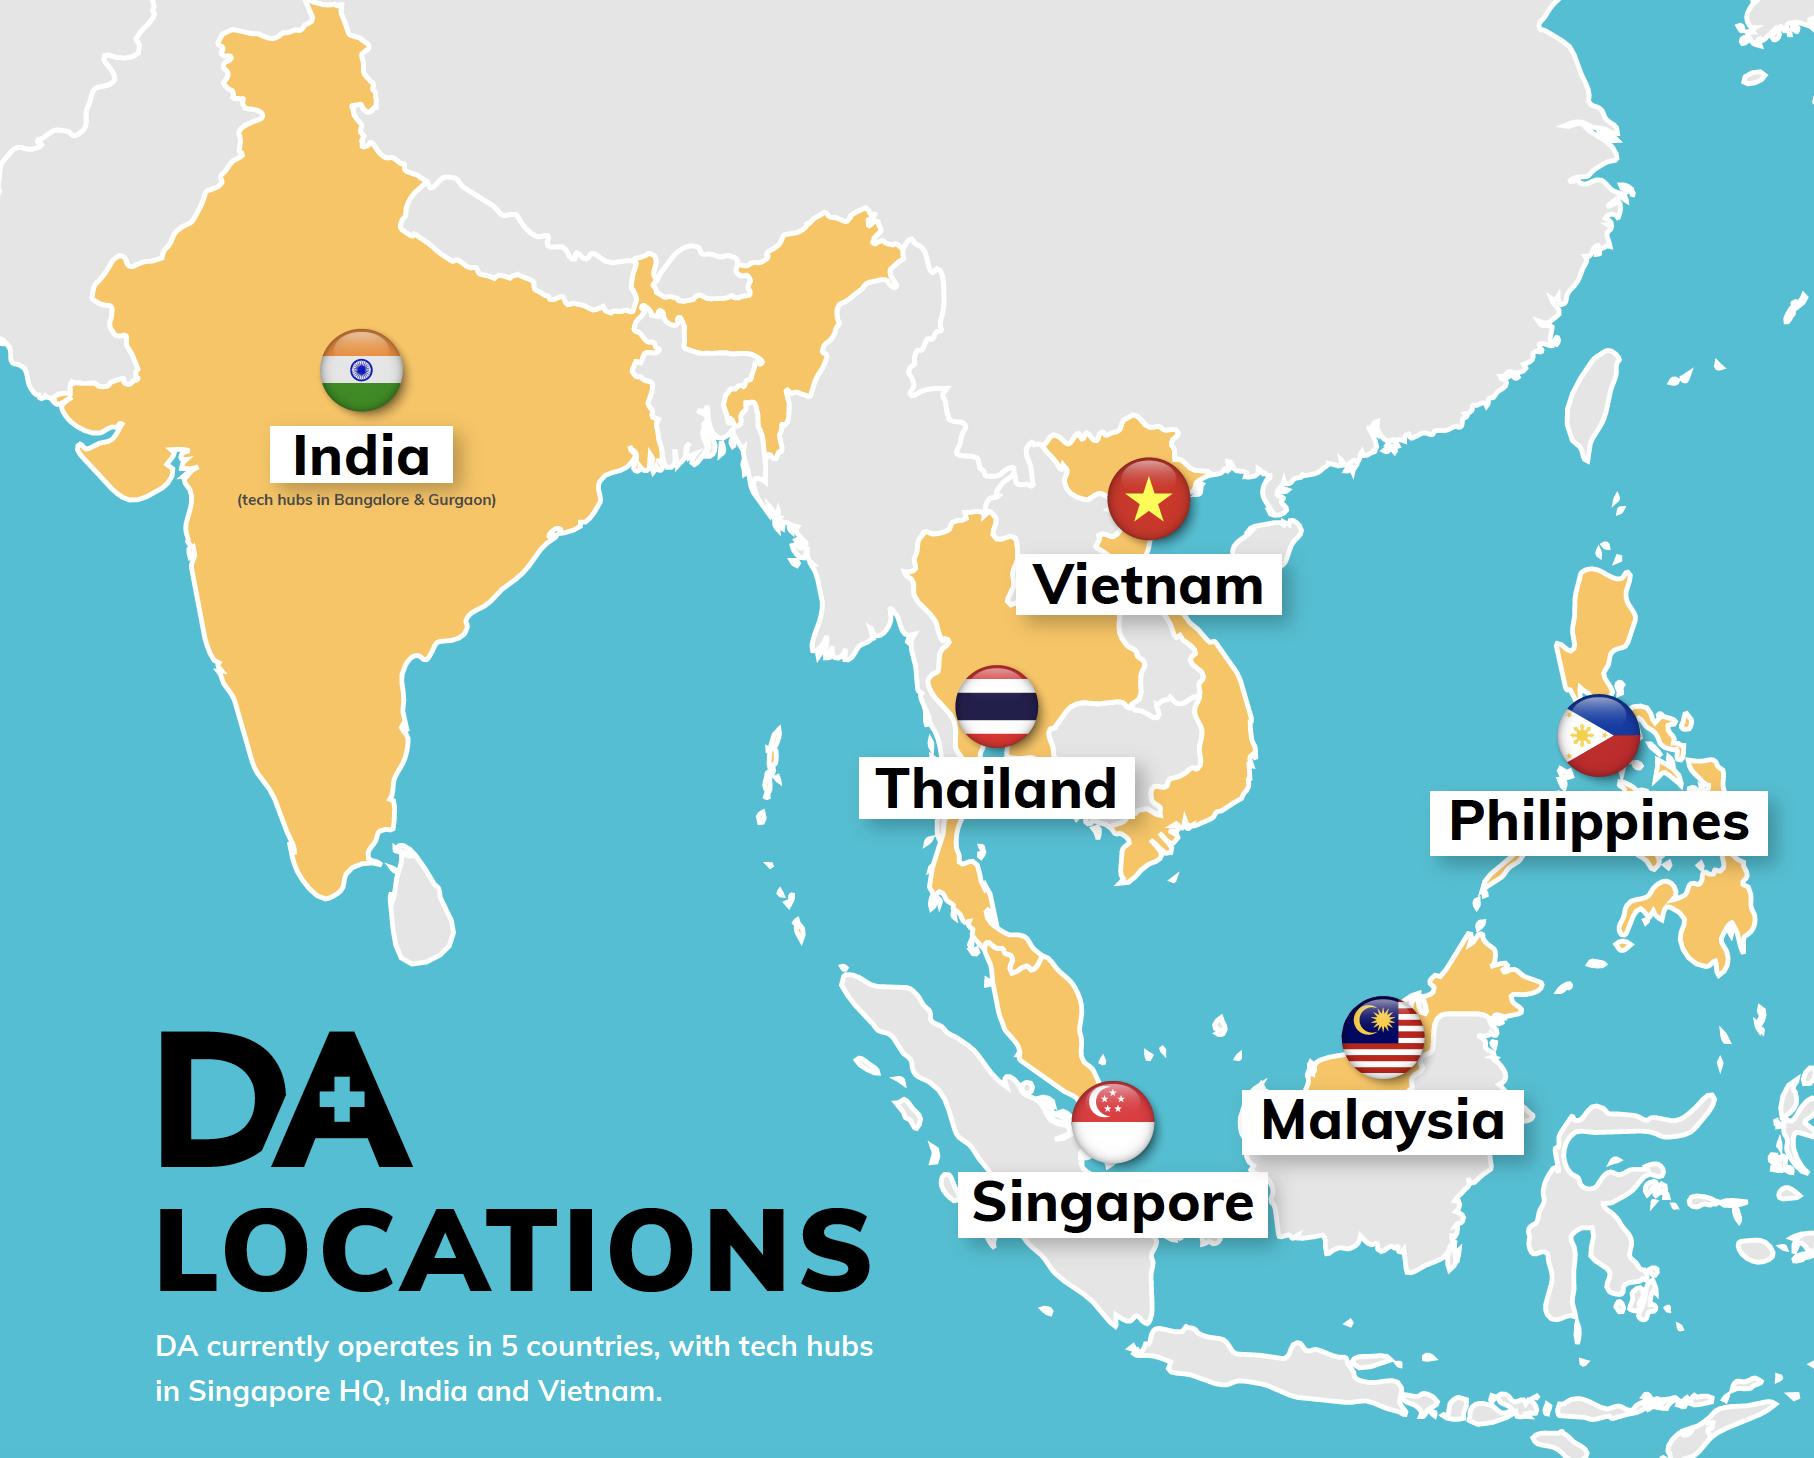 DA's locations across the region